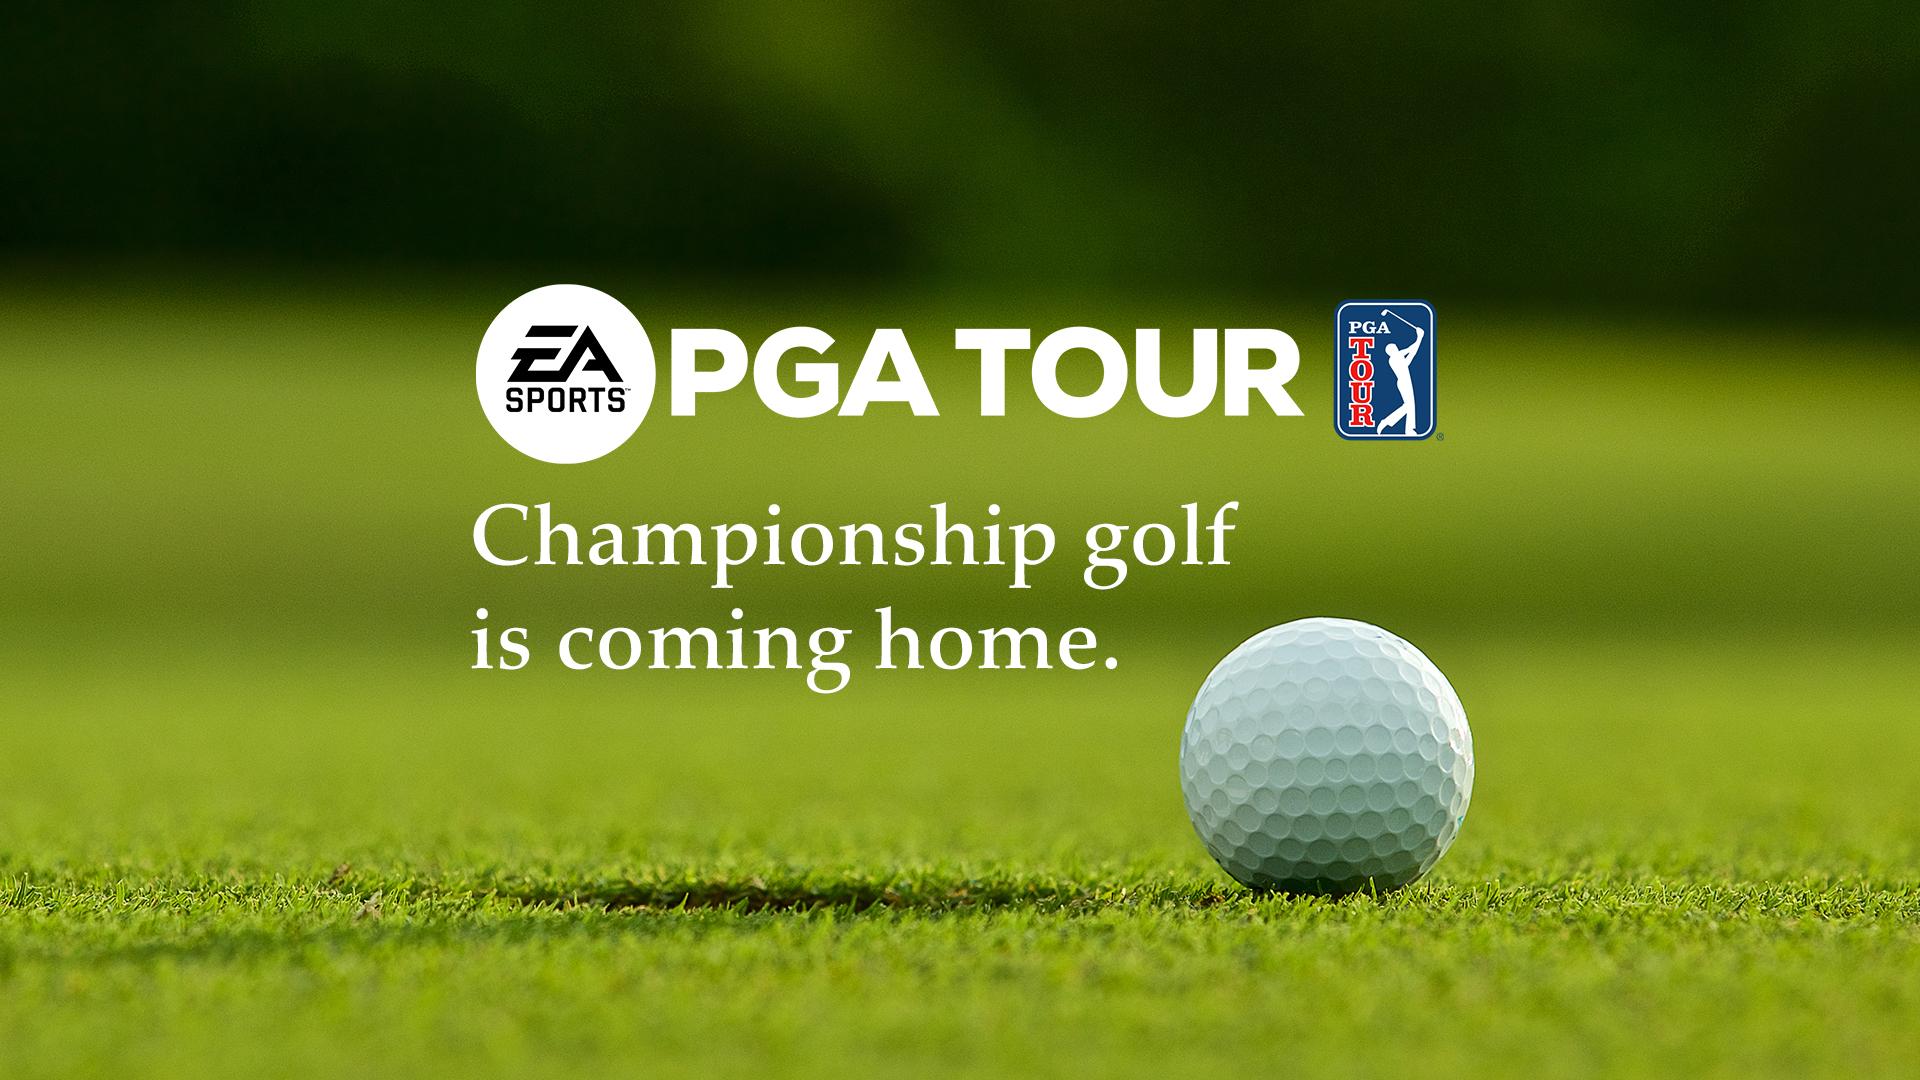 EA Sports PGA TOUR Announced